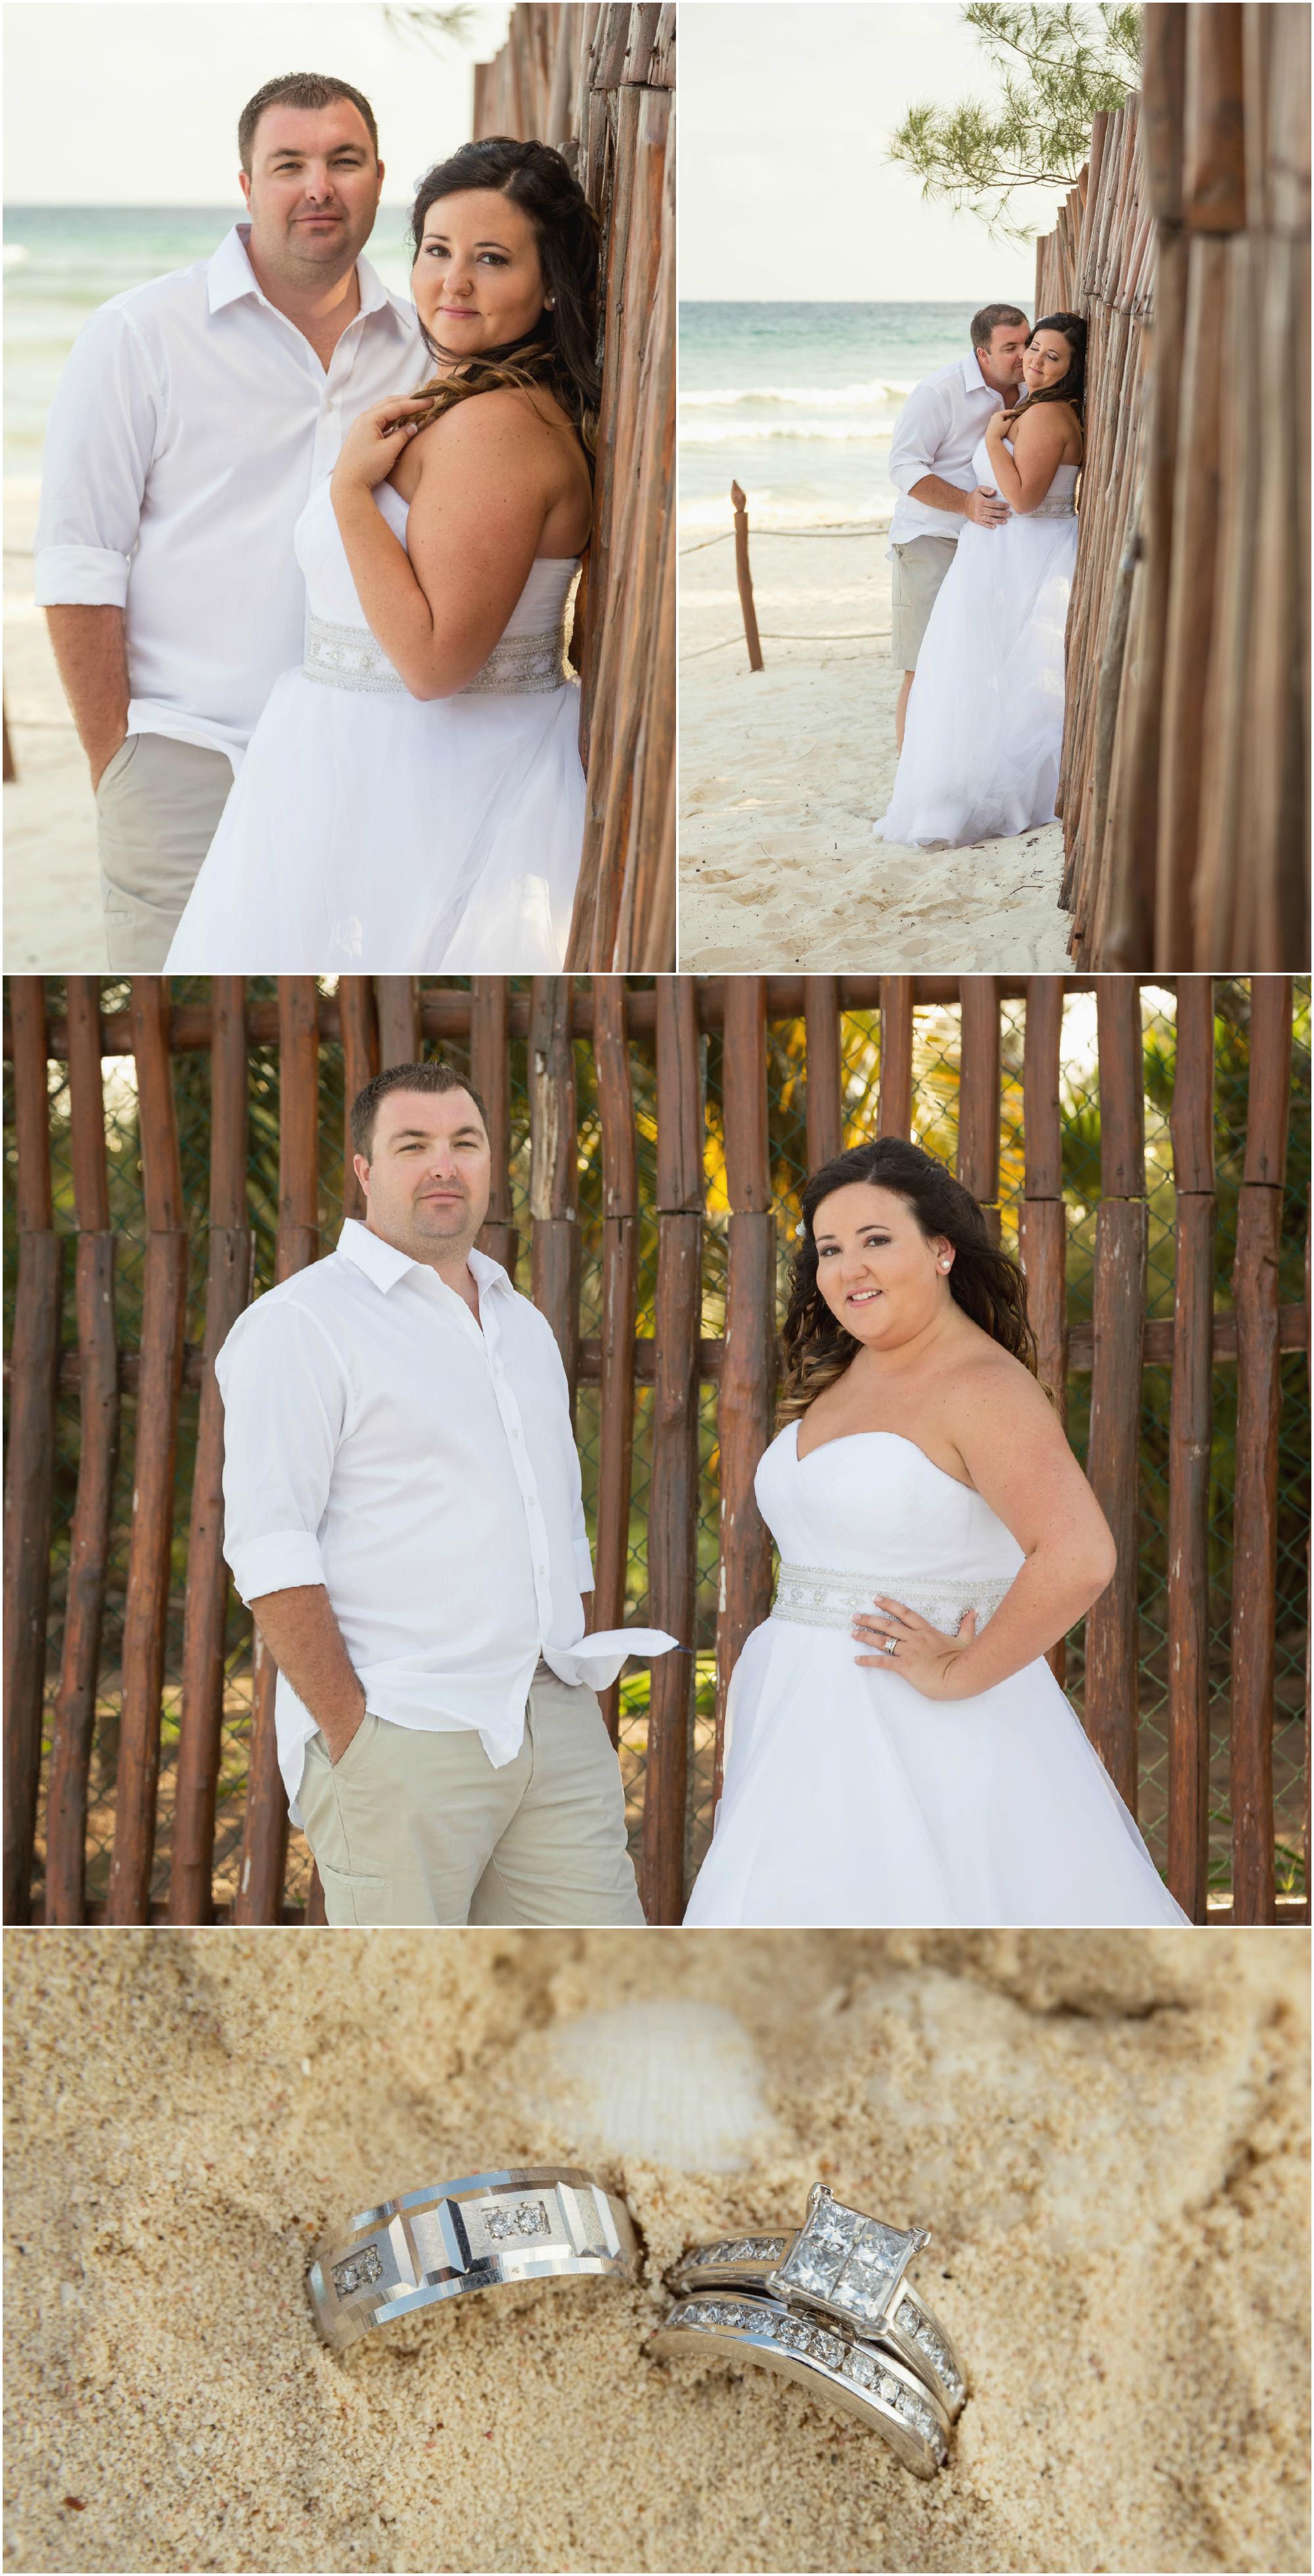 riviera-maya-wedding-ttd_1.png